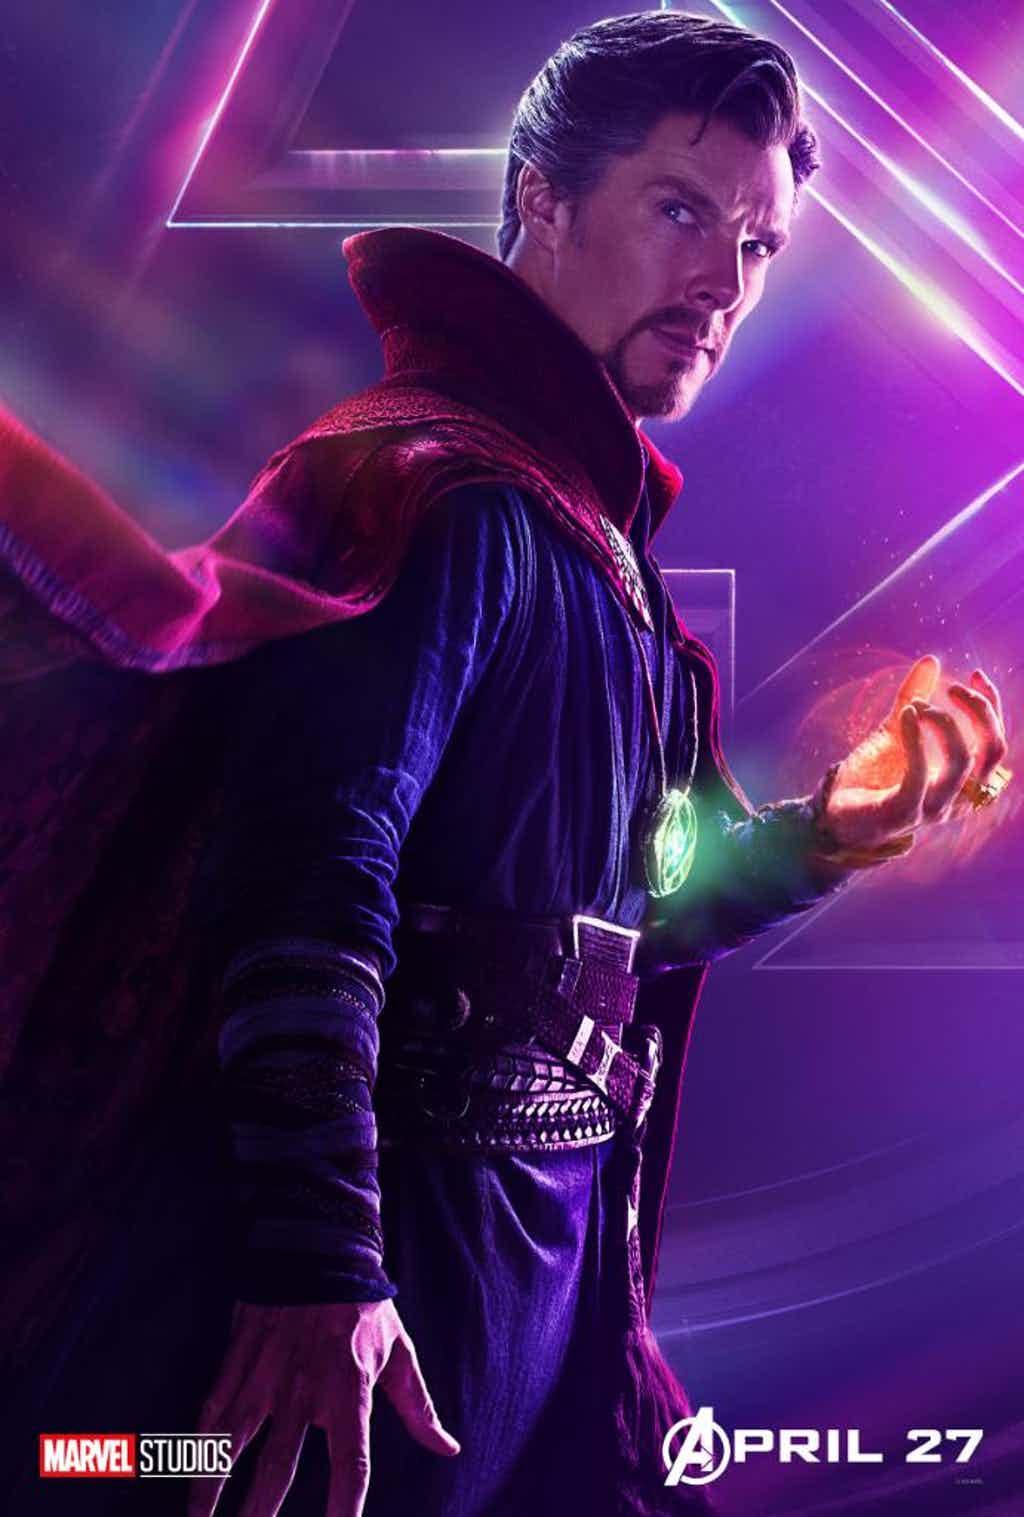 szmk_marvel_infinity_war_vegtelen_haboru_bosszuallok_avengers_ironman_hulk_thor_captainamaerica_guardians_galaxy_3.jpg